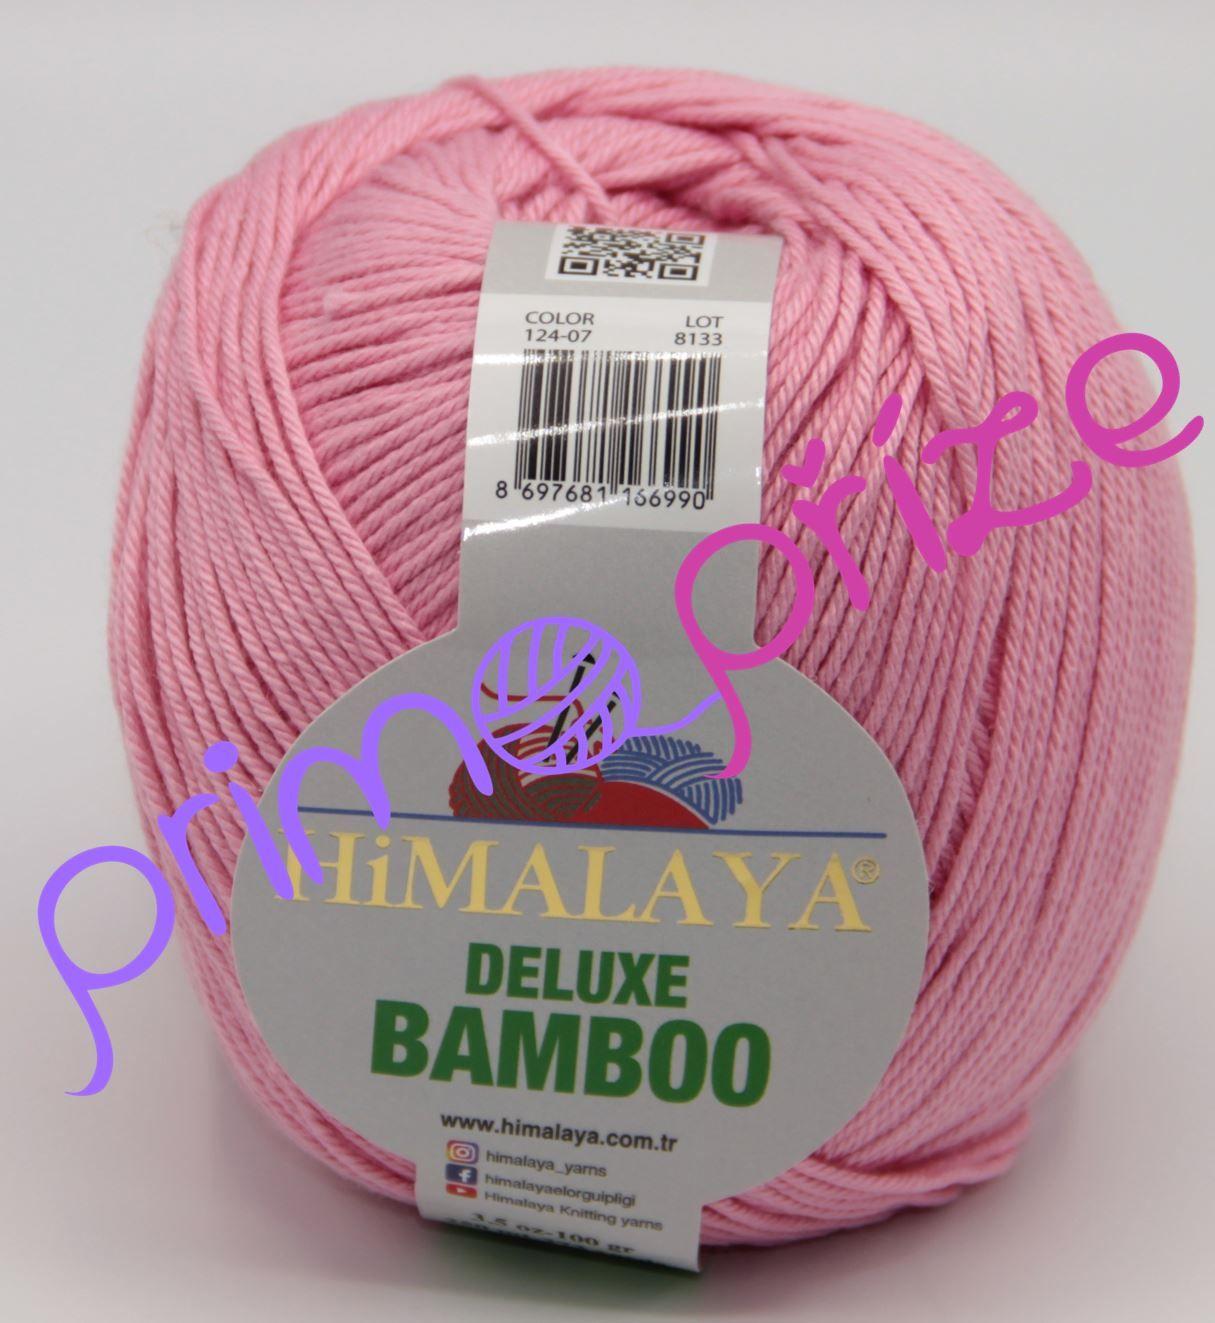 HIMALAYA Deluxe Bamboo 124-07 růžová